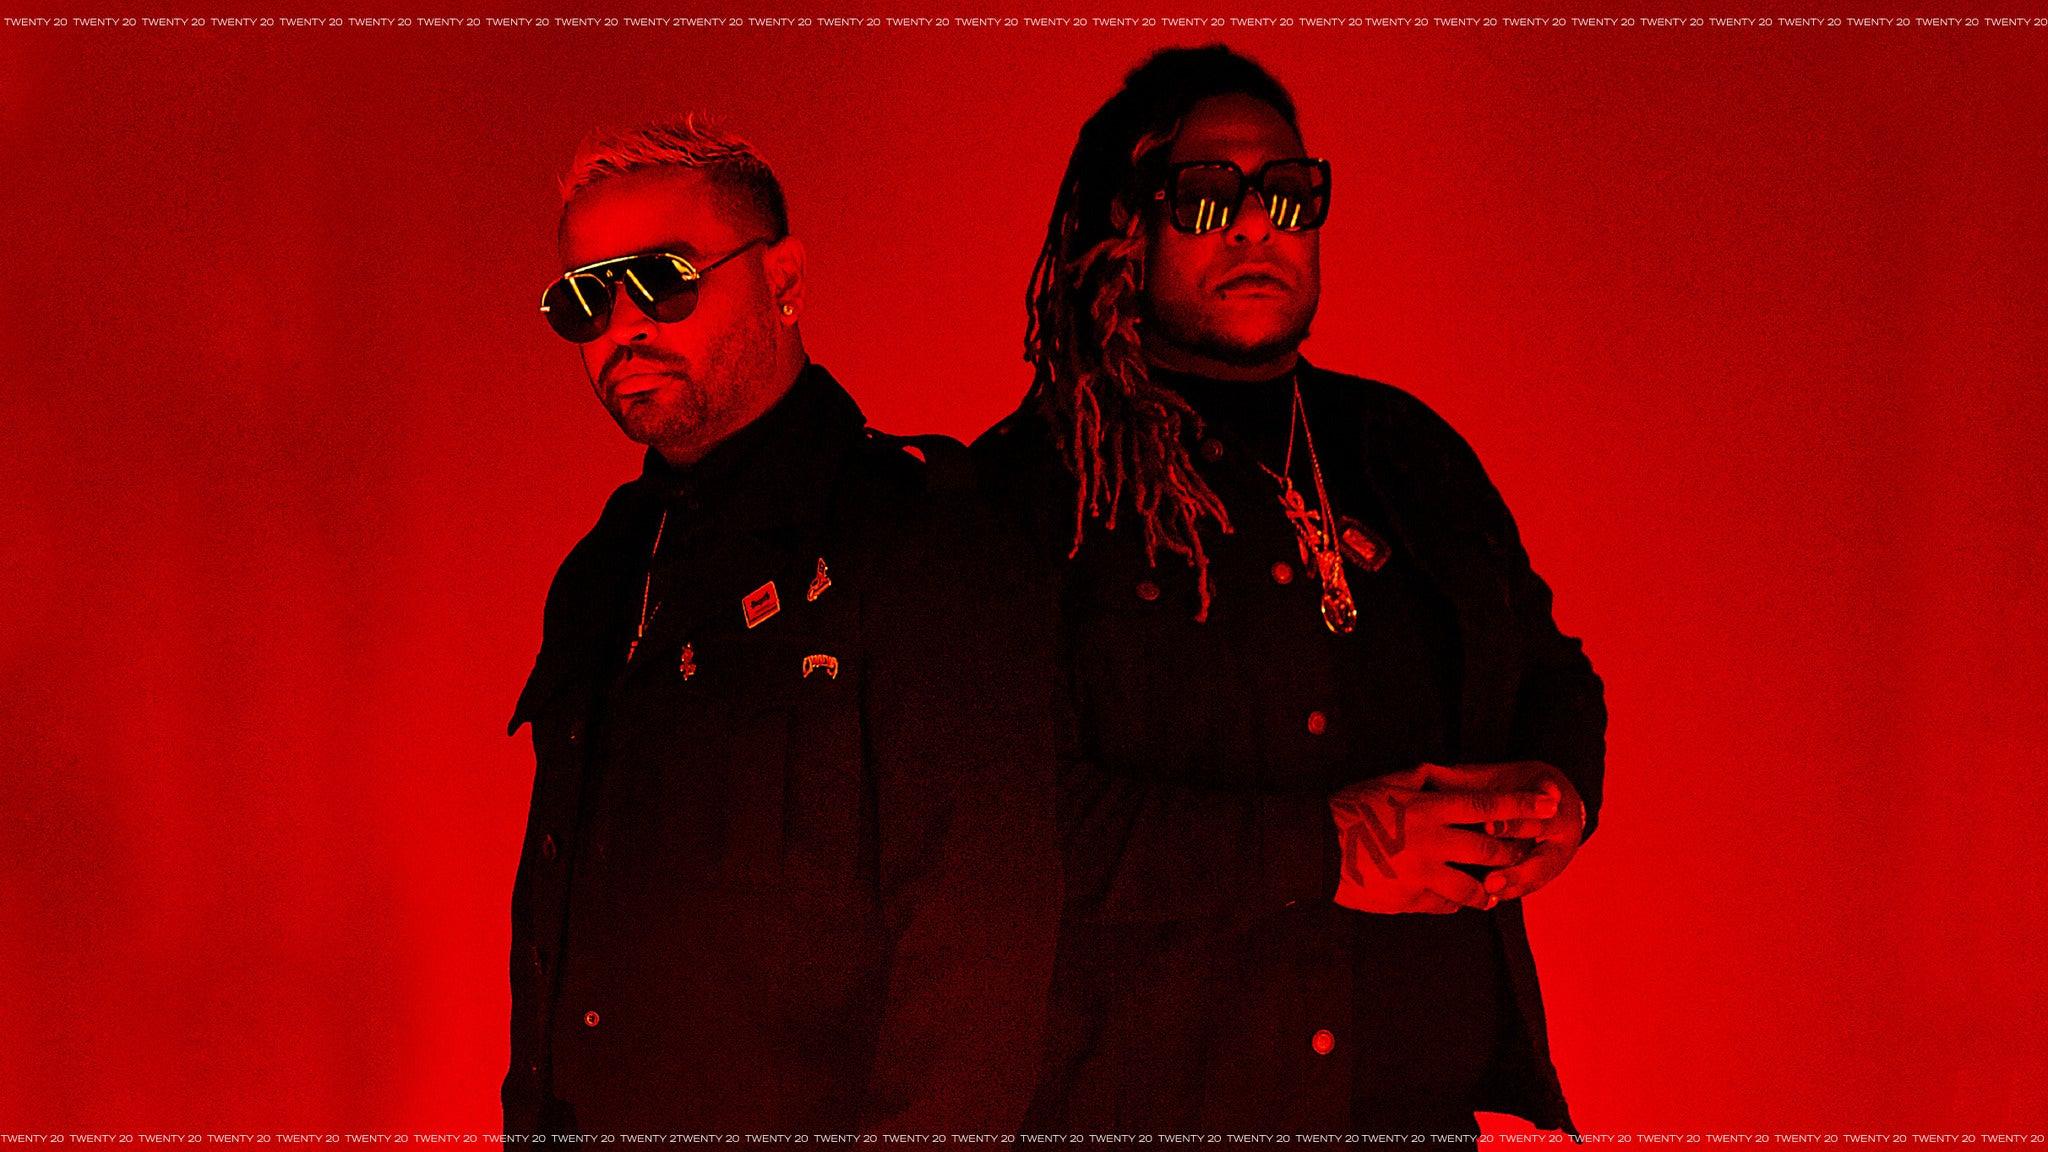 Zion & Lennox - Iconic Usa Tour 2020 at EagleBank Arena